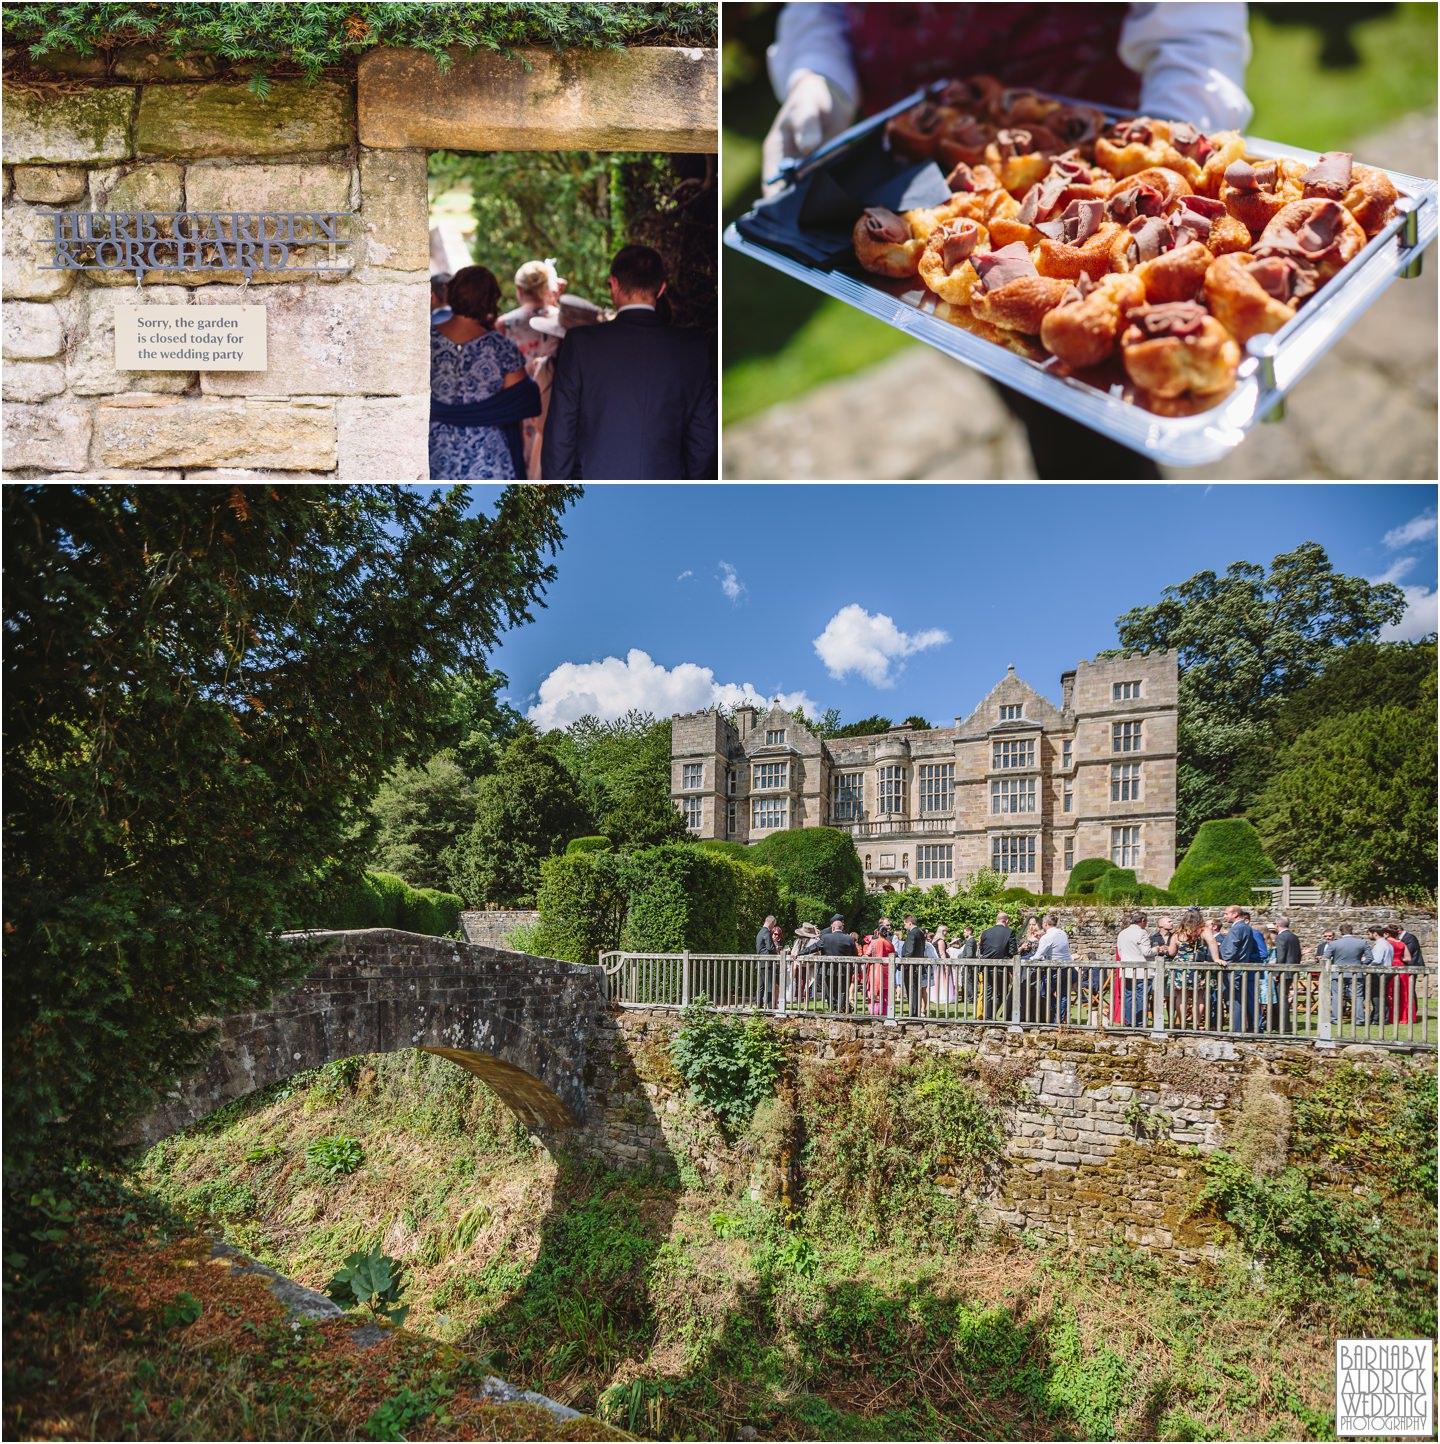 Fountains-Abbey-National-Trust-Wedding-reception-Yorkshire